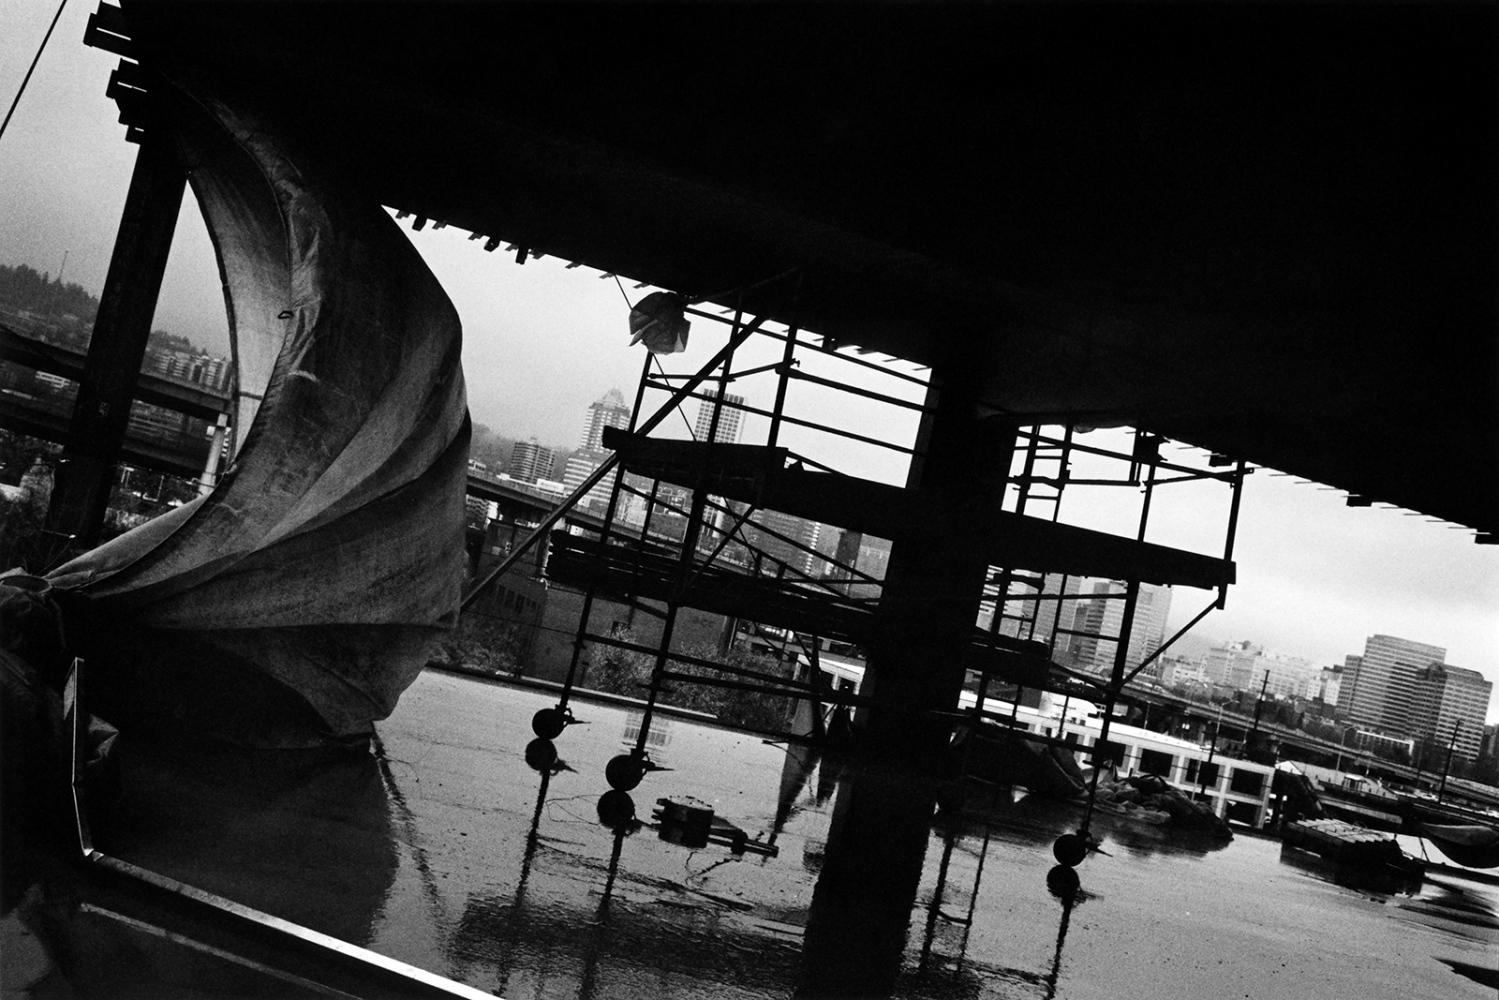 Art and Documentary Photography - Loading LF_vis_013.jpg